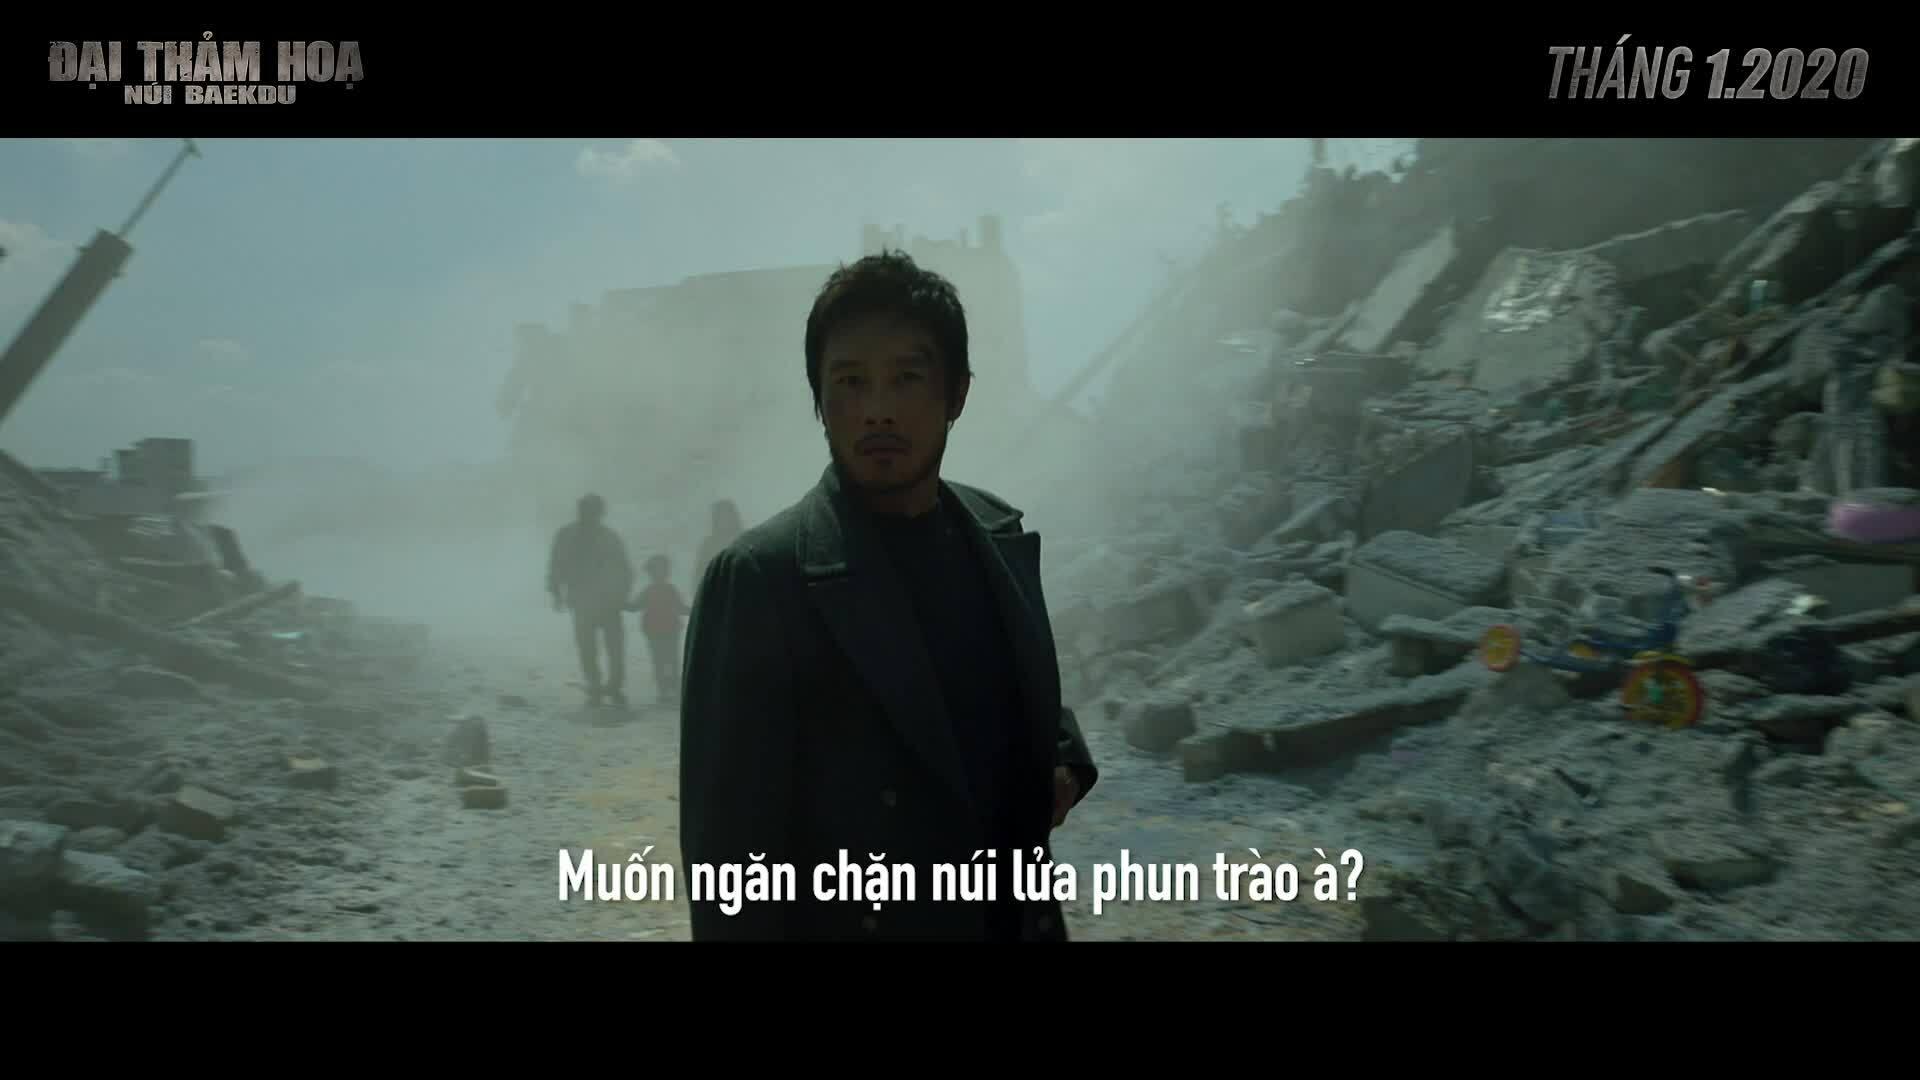 Đại thảm họa núi Baekdu Trailer